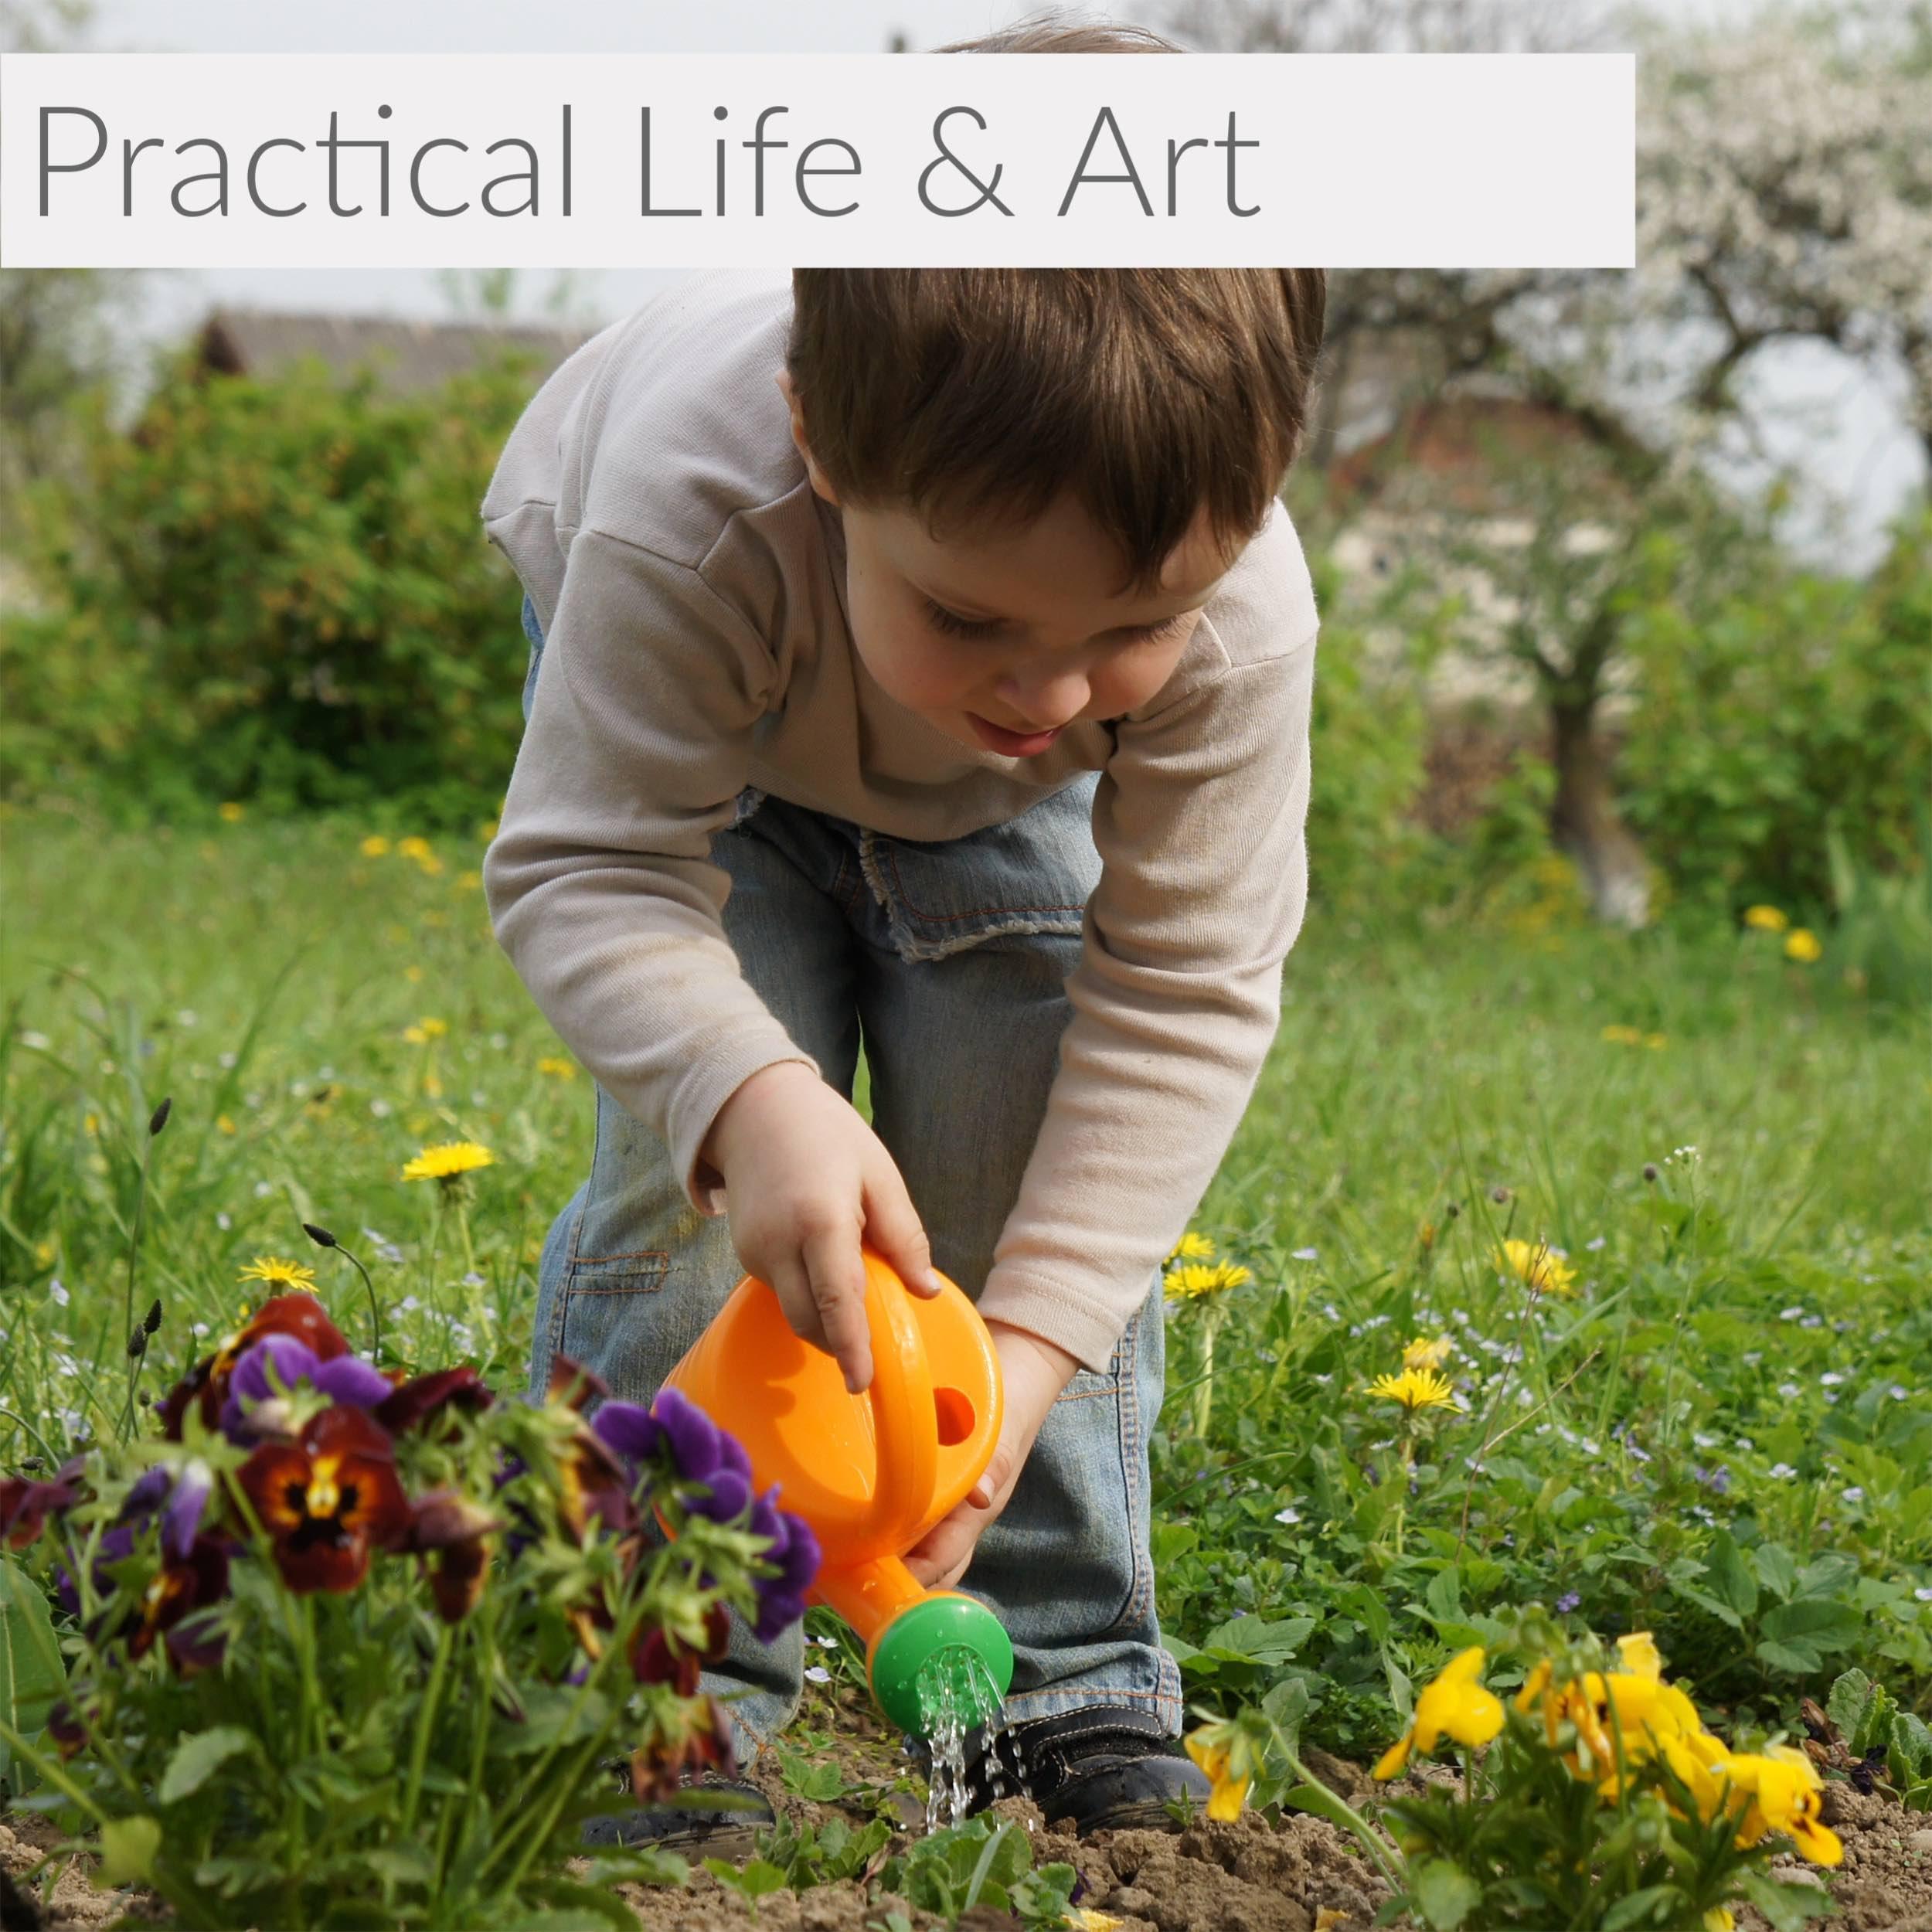 Unit 3 - Practical Life - Image.jpg